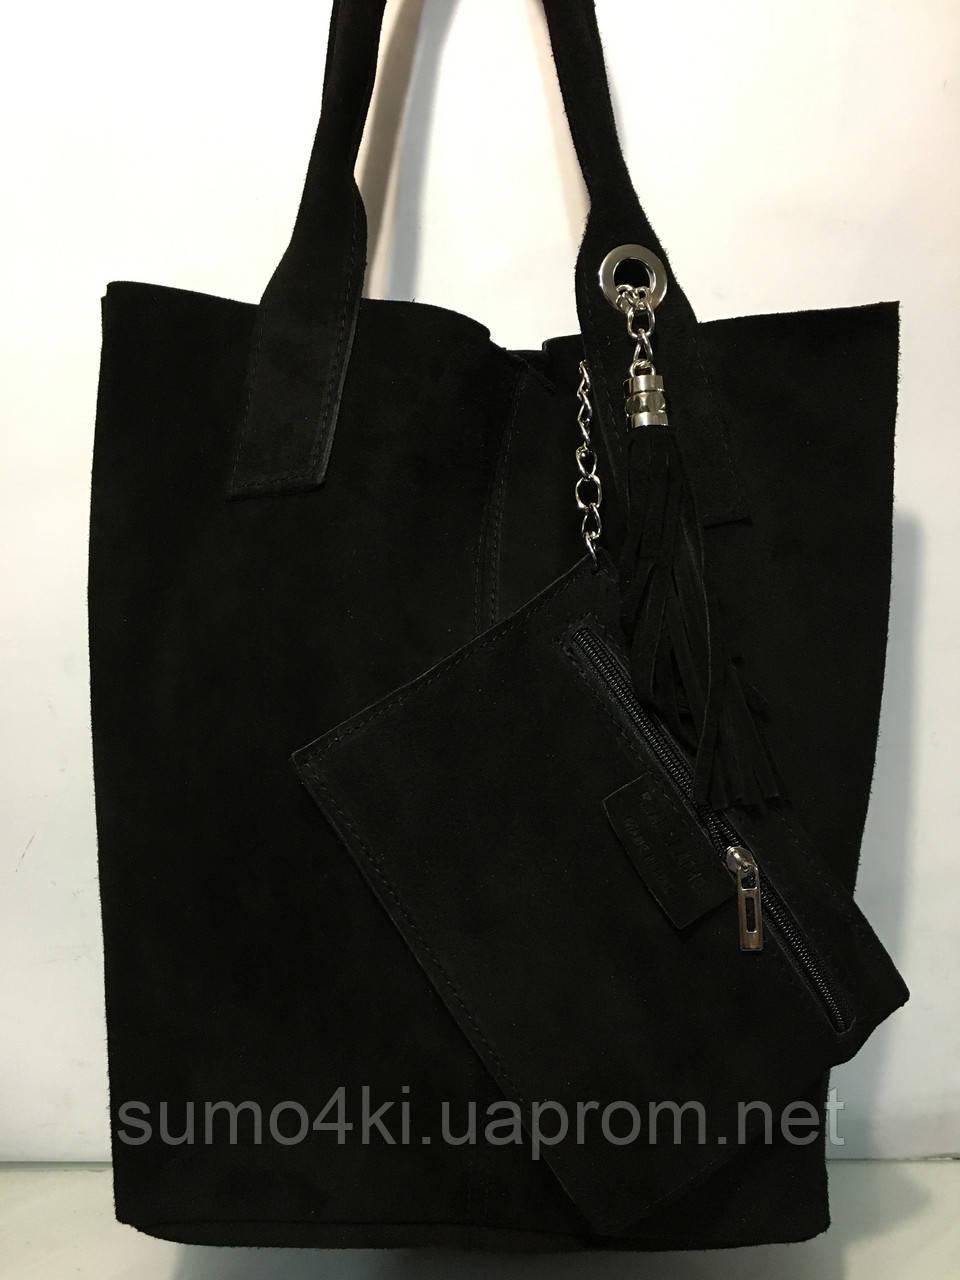 Замшевая сумка мешок торба, цена 1 600 грн., купить Одеса — Prom.ua ... 34e5ddcb881